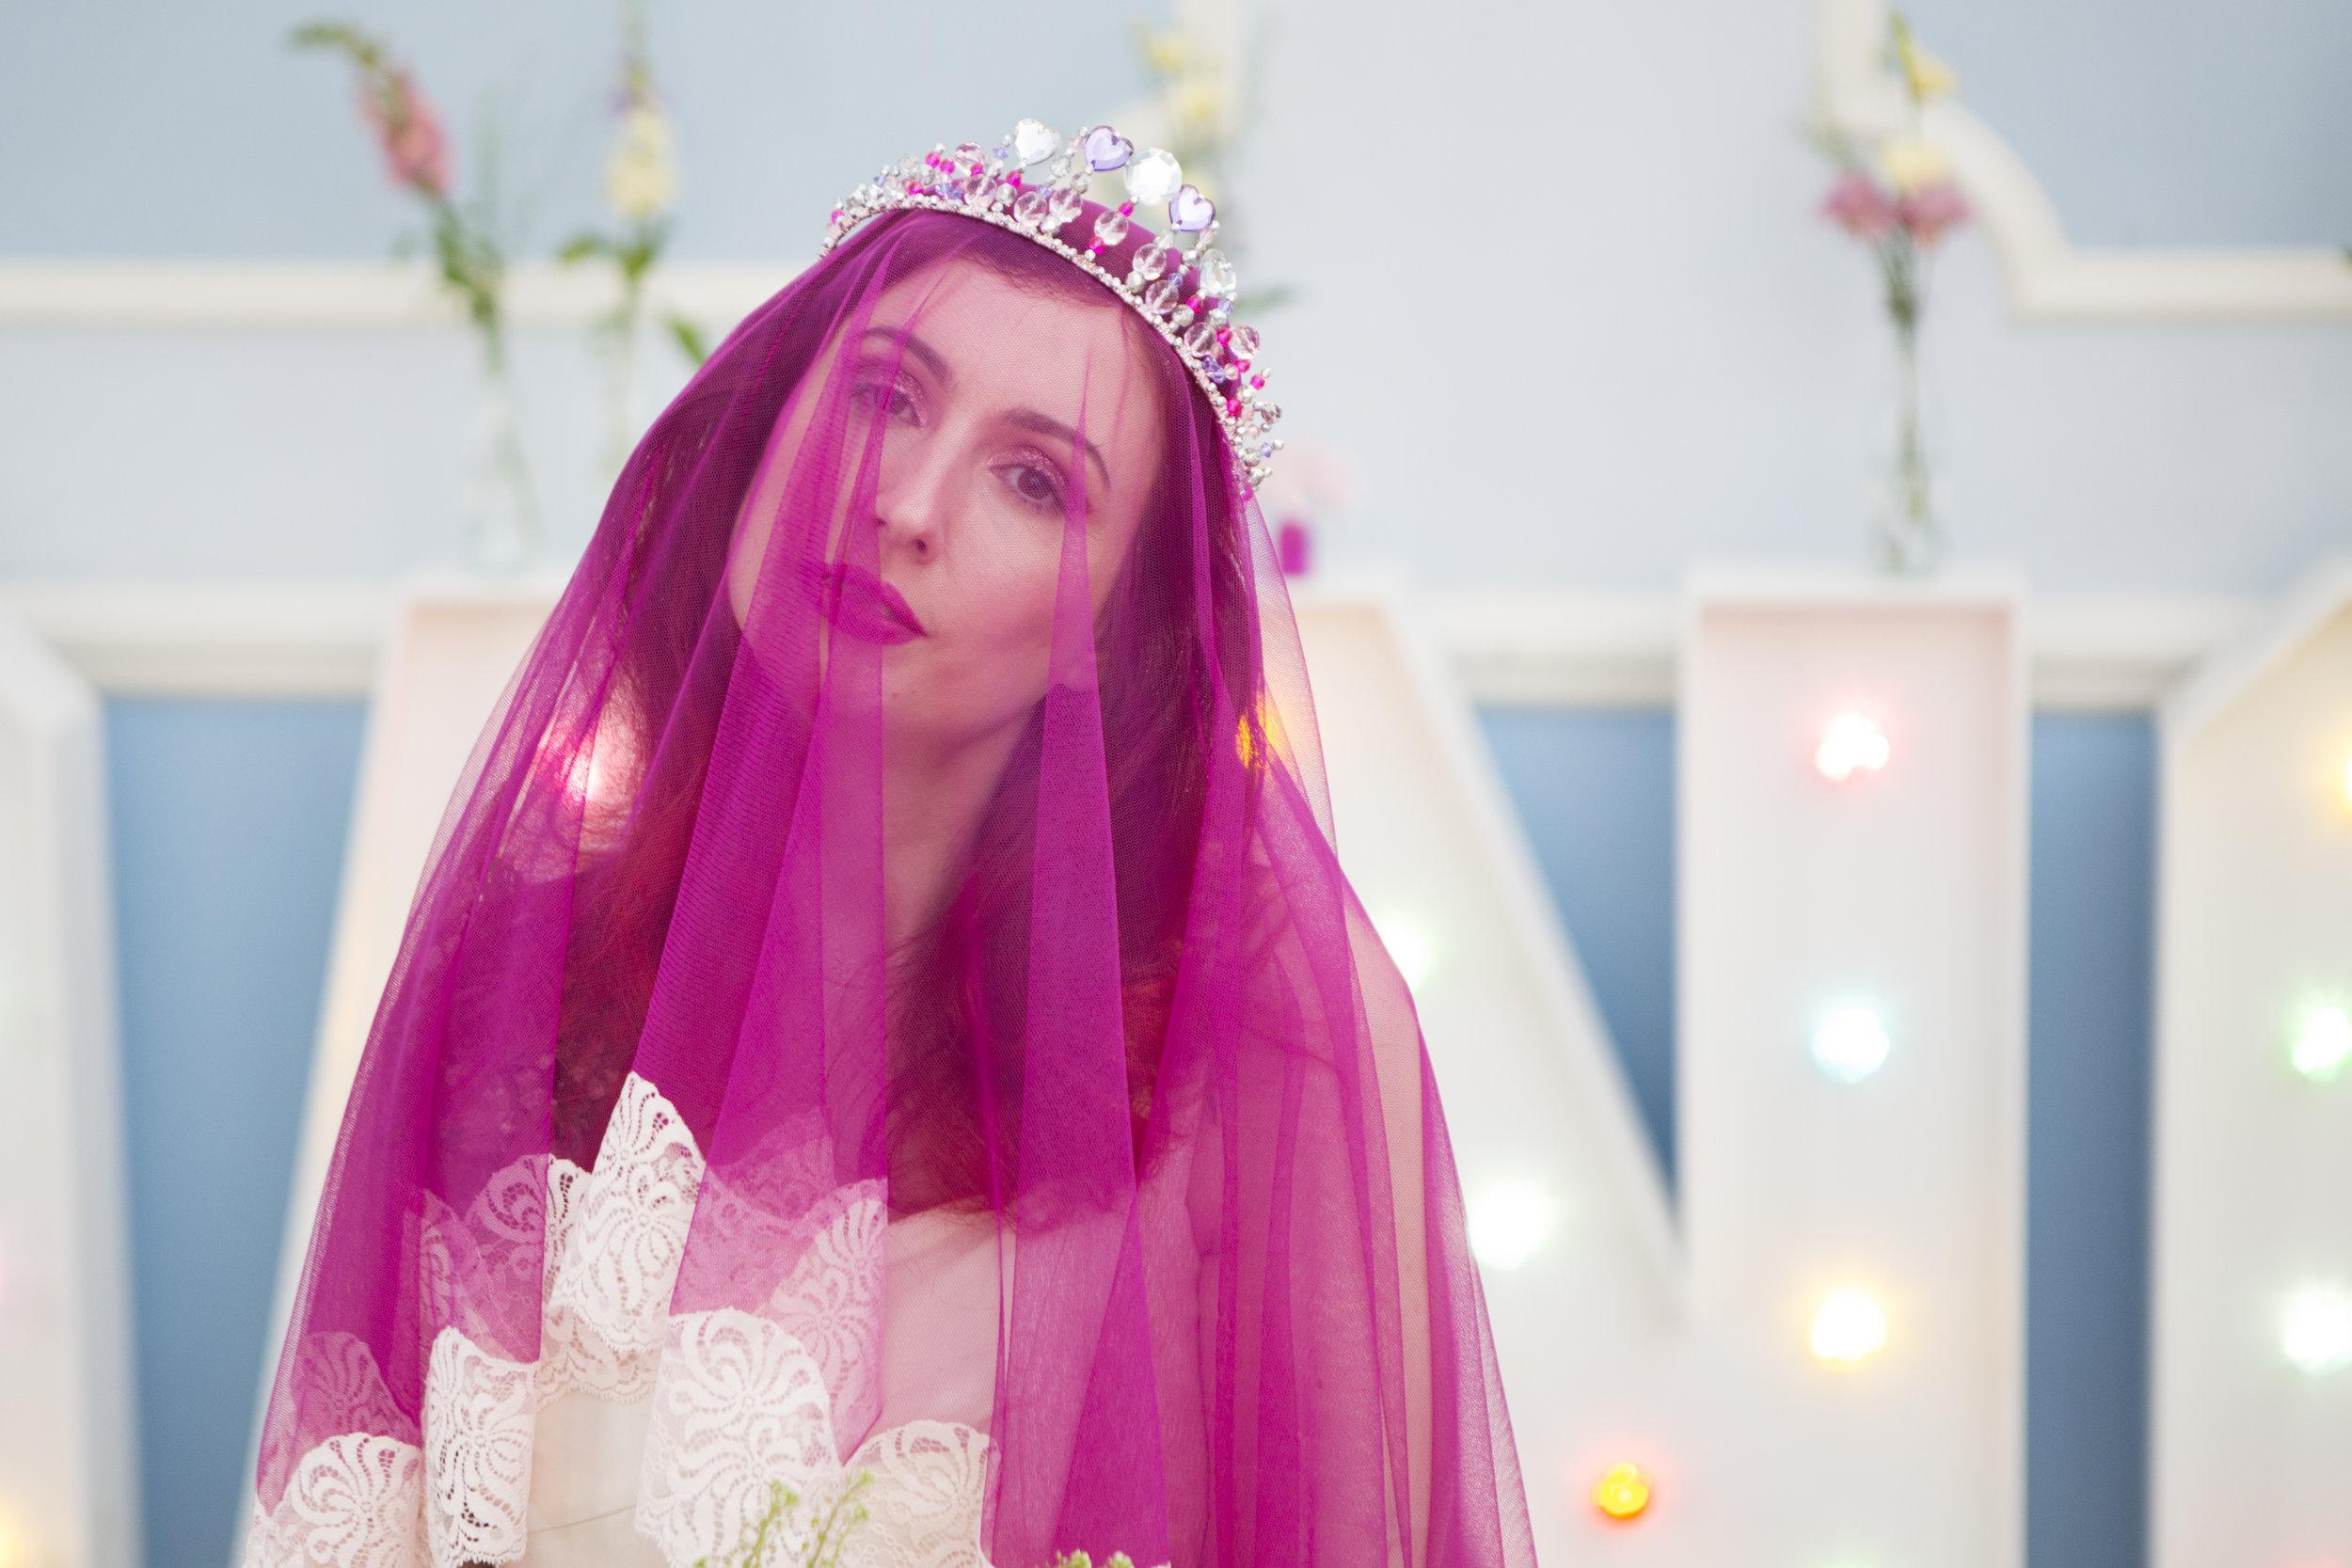 Prom Night Wedding Shoot Meadham Kirchhoff Carrie 00114.jpg